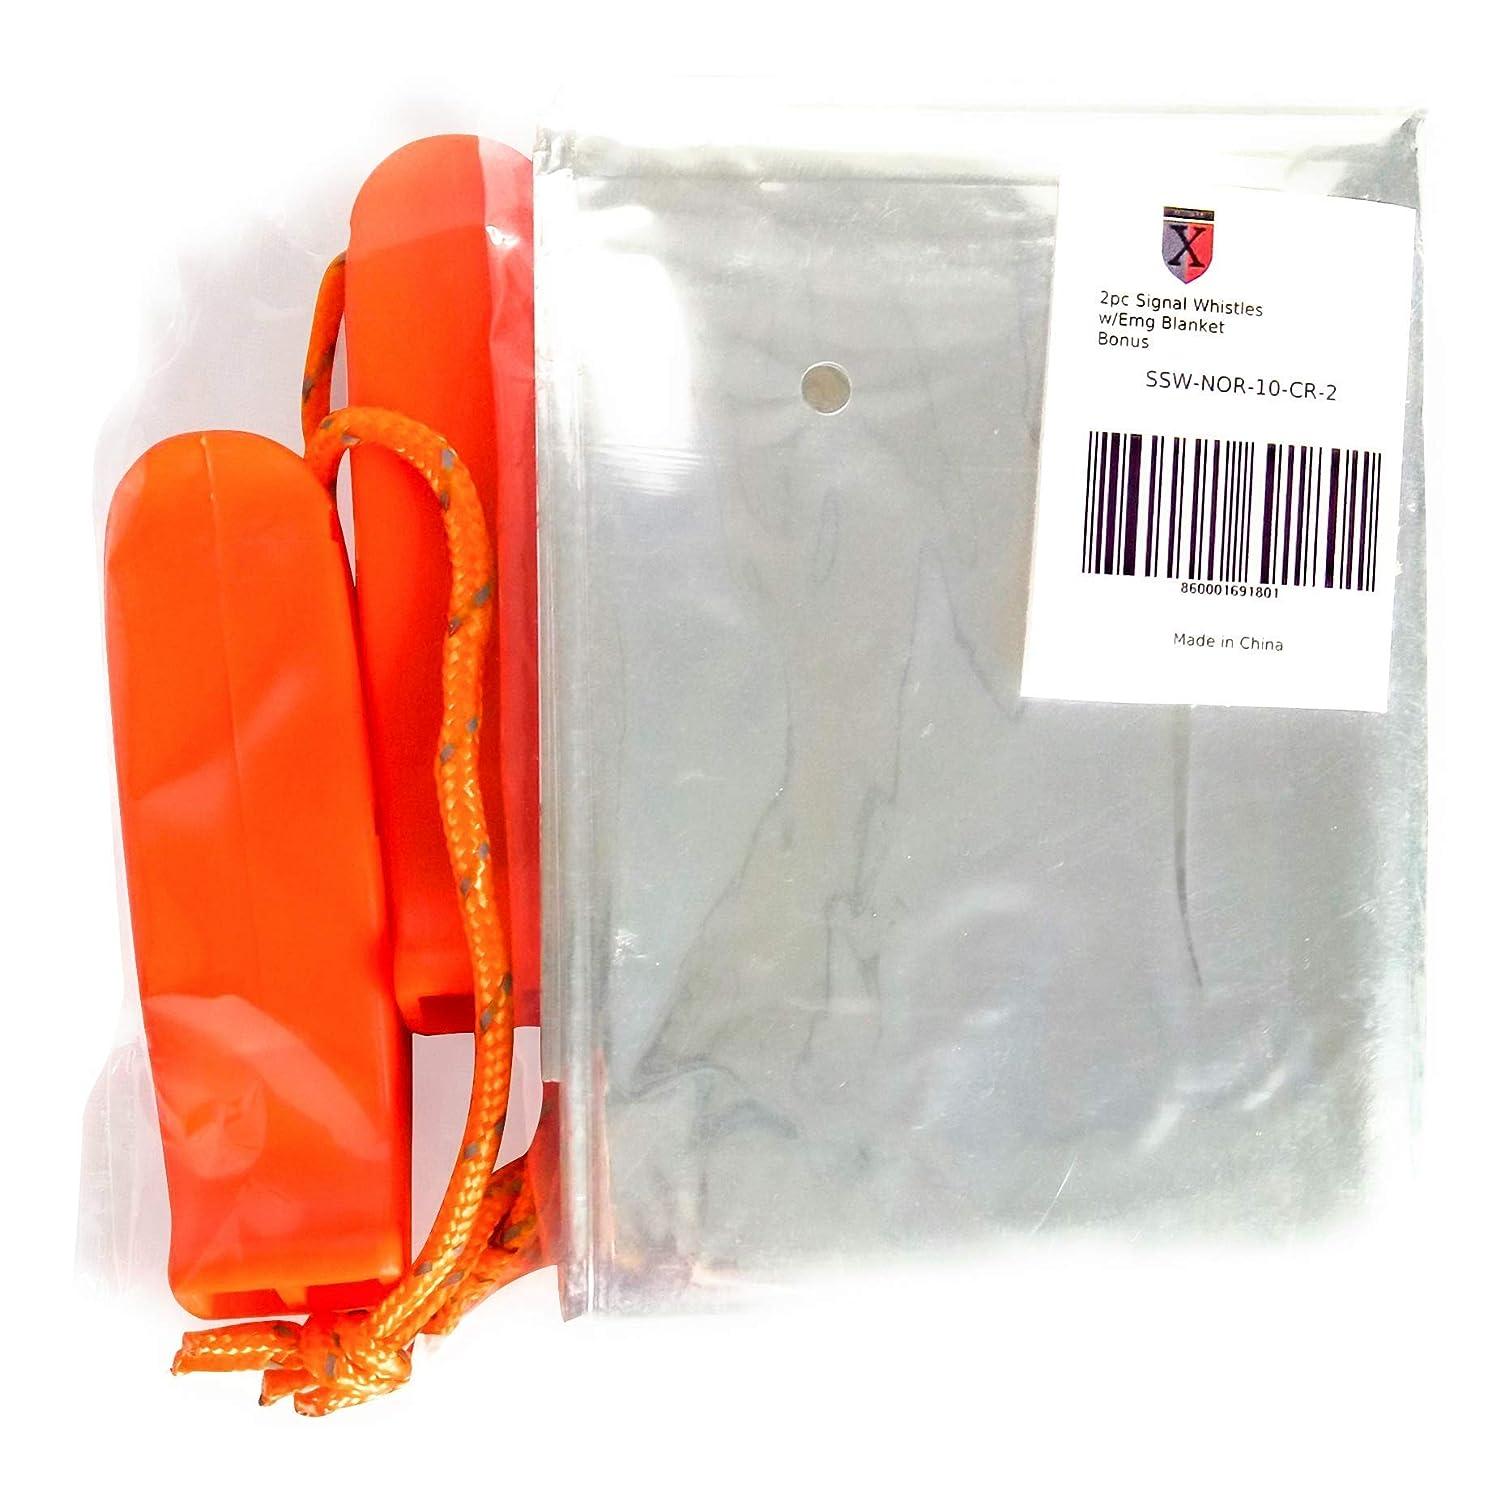 Seguridad Pl/ástico Naranja con Manta de Emergencia Emergencia Xedmark 2 Silbatos Se/ñales Supervivencia